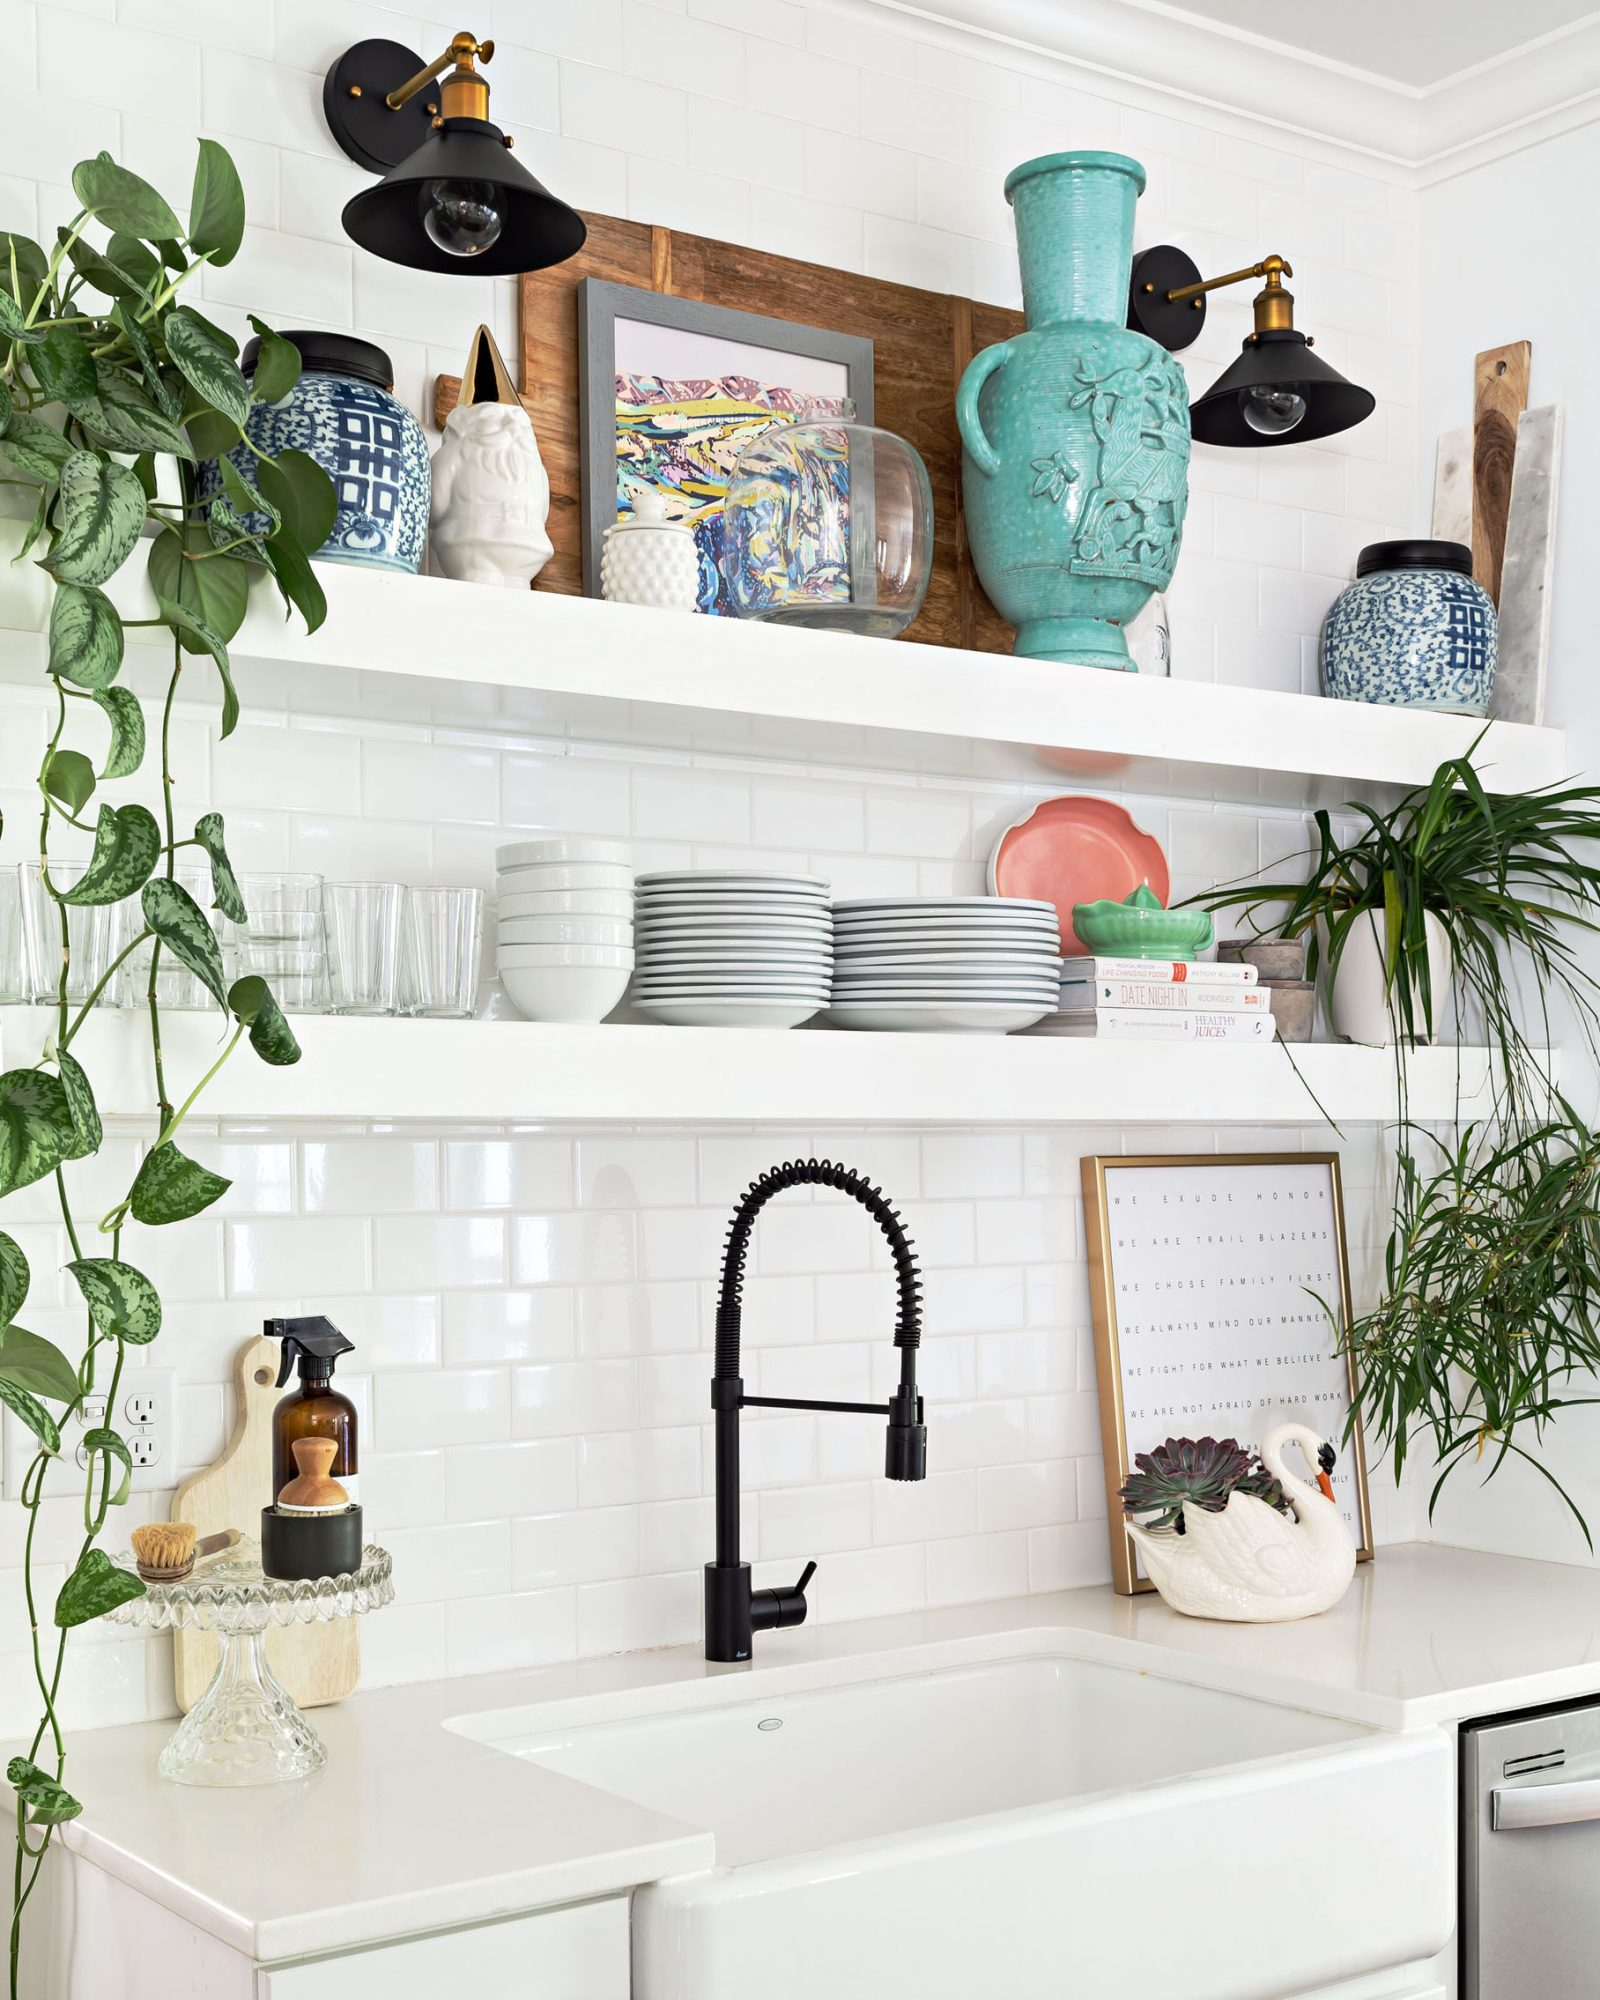 white tile backsplash and white kitchen sink